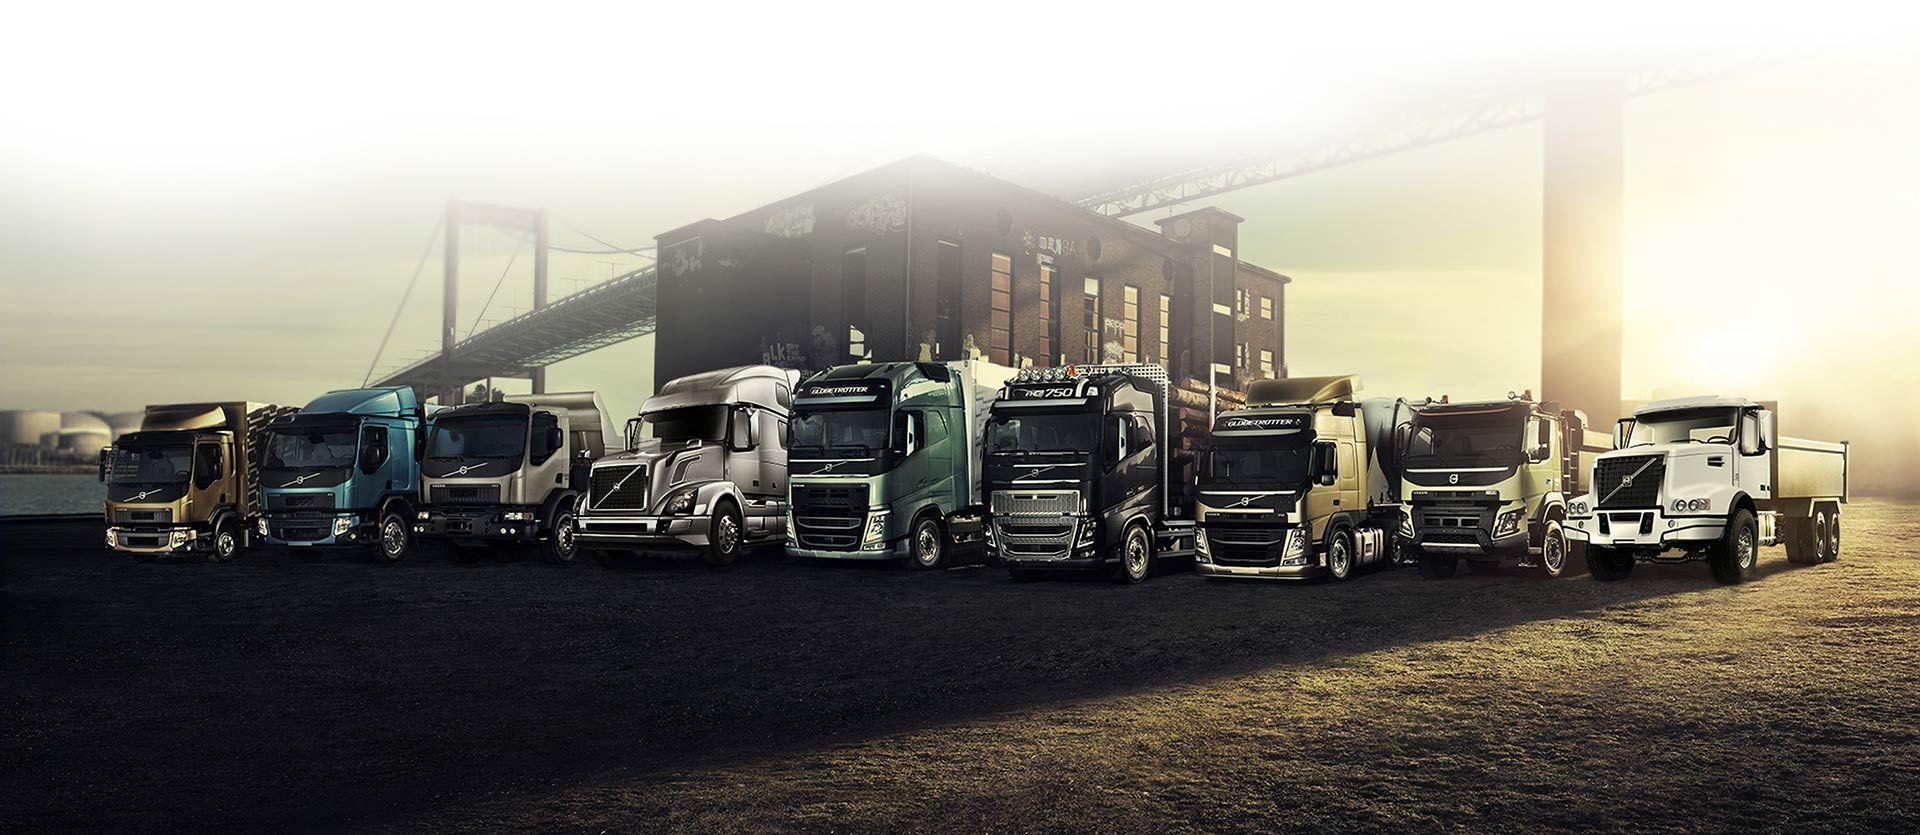 Volvo Truck Dealer >> Nearest Volvo Truck Dealer Nearest Volvo Truck Dealership